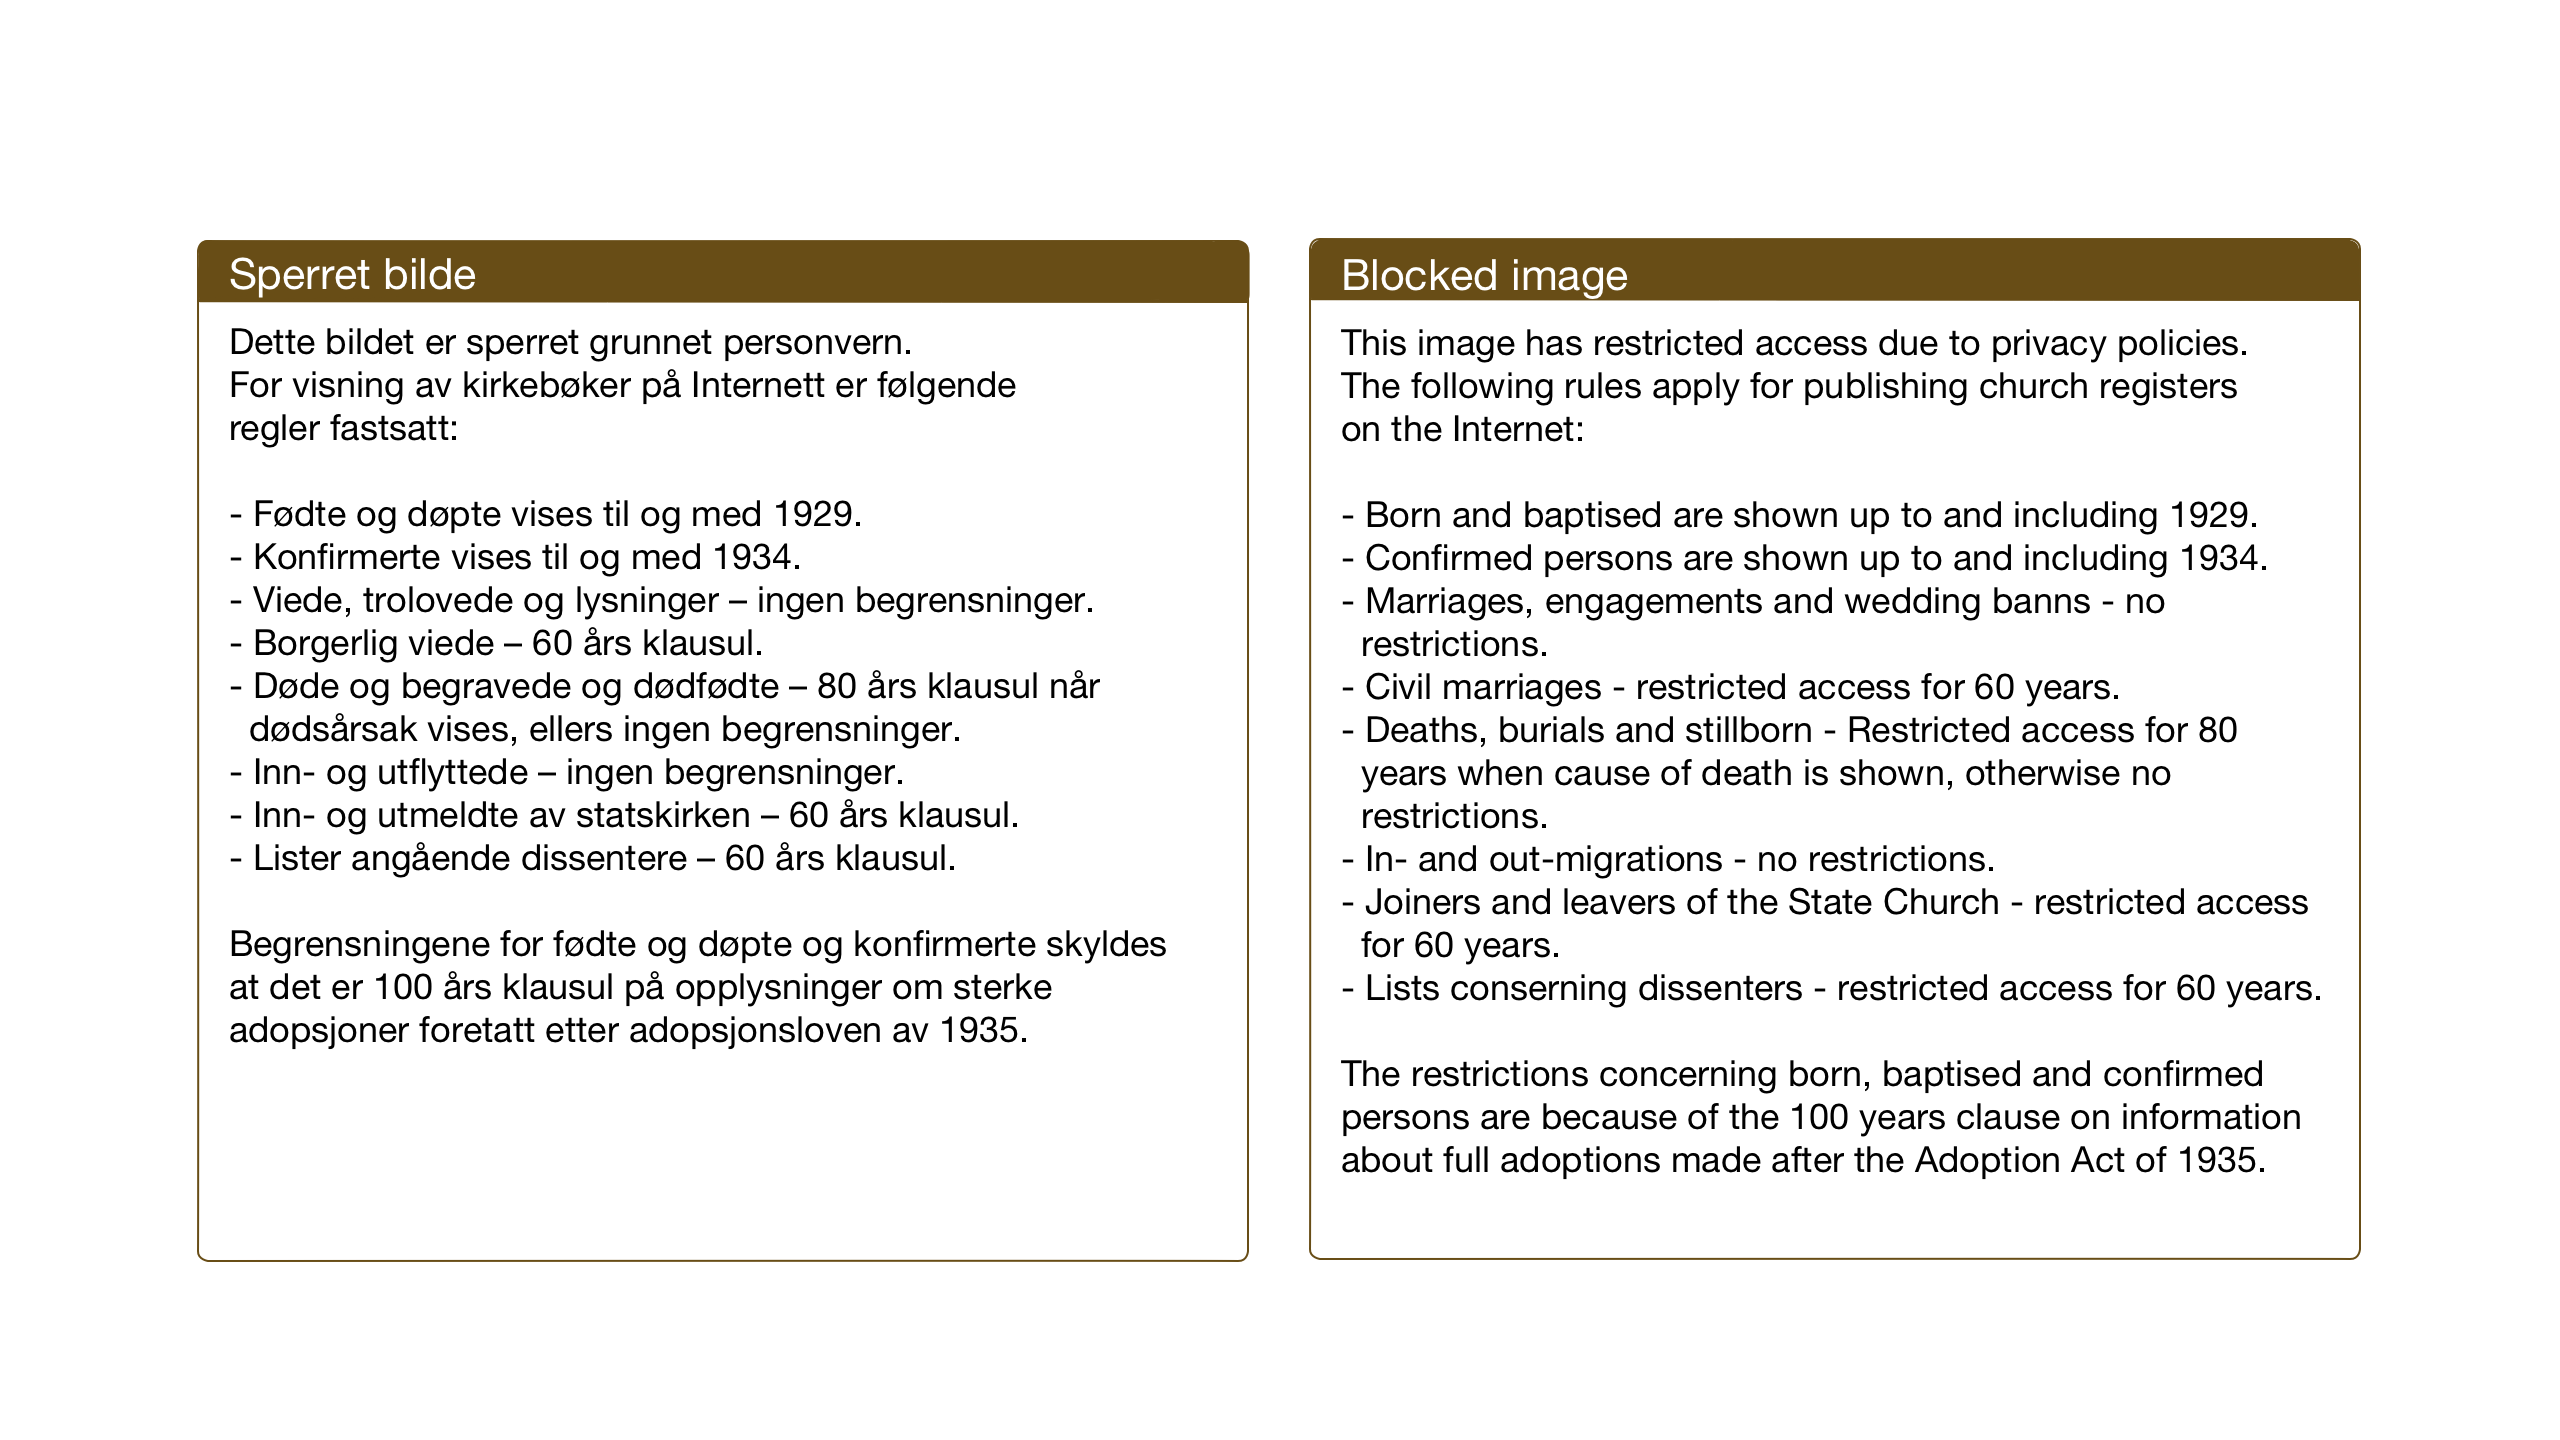 SAT, Ministerialprotokoller, klokkerbøker og fødselsregistre - Nordland, 882/L1183: Klokkerbok nr. 882C01, 1911-1938, s. 223